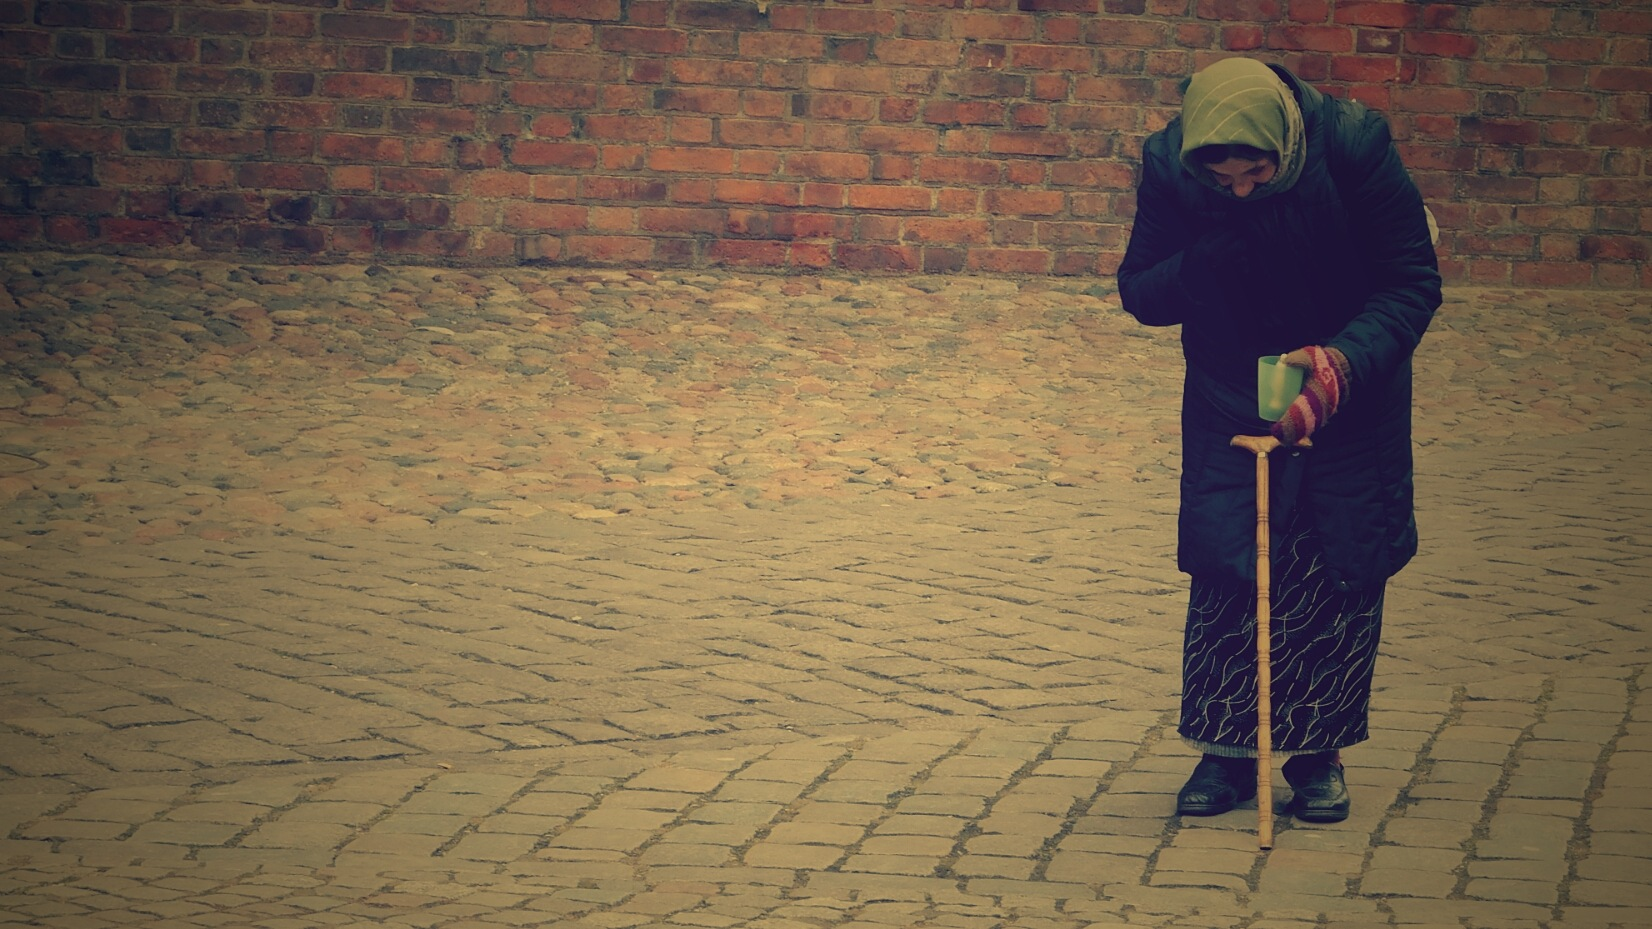 Emptiness ... by N.S. GDANSK